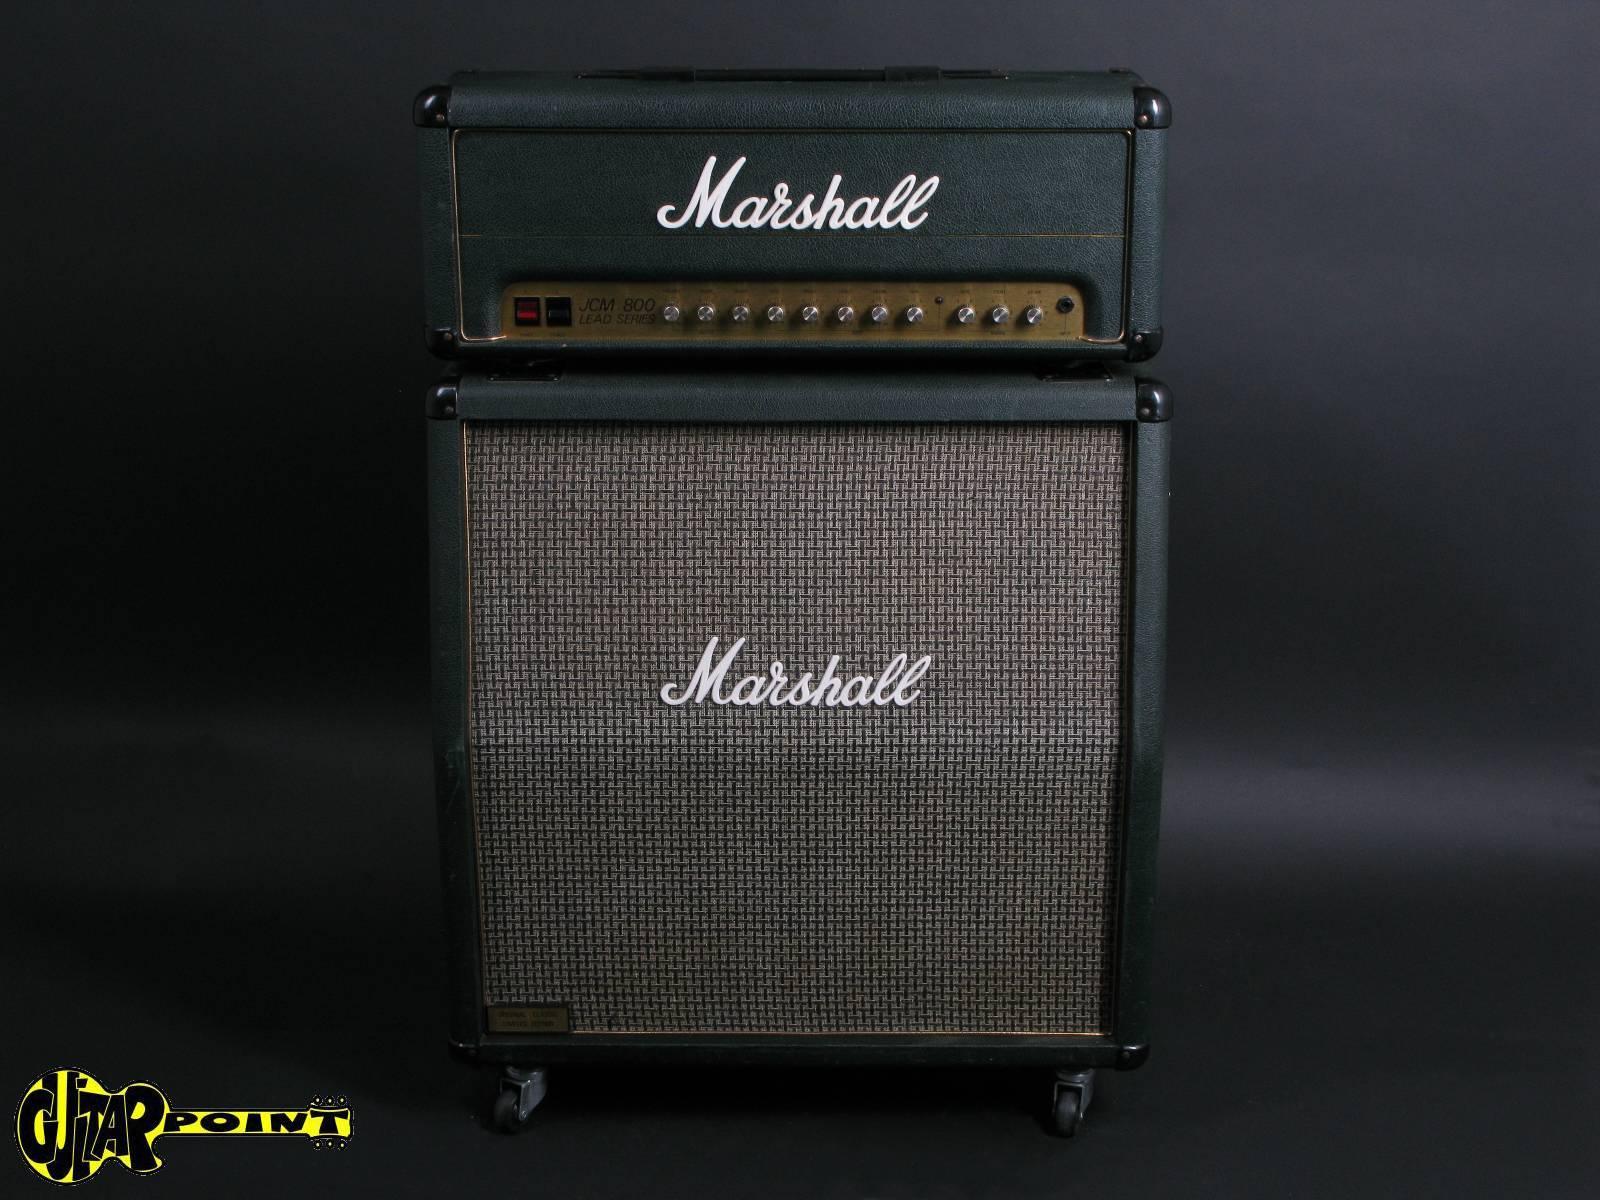 "1986 Marshall JCM800 Limited 100W +  4x12"" cab - Green"